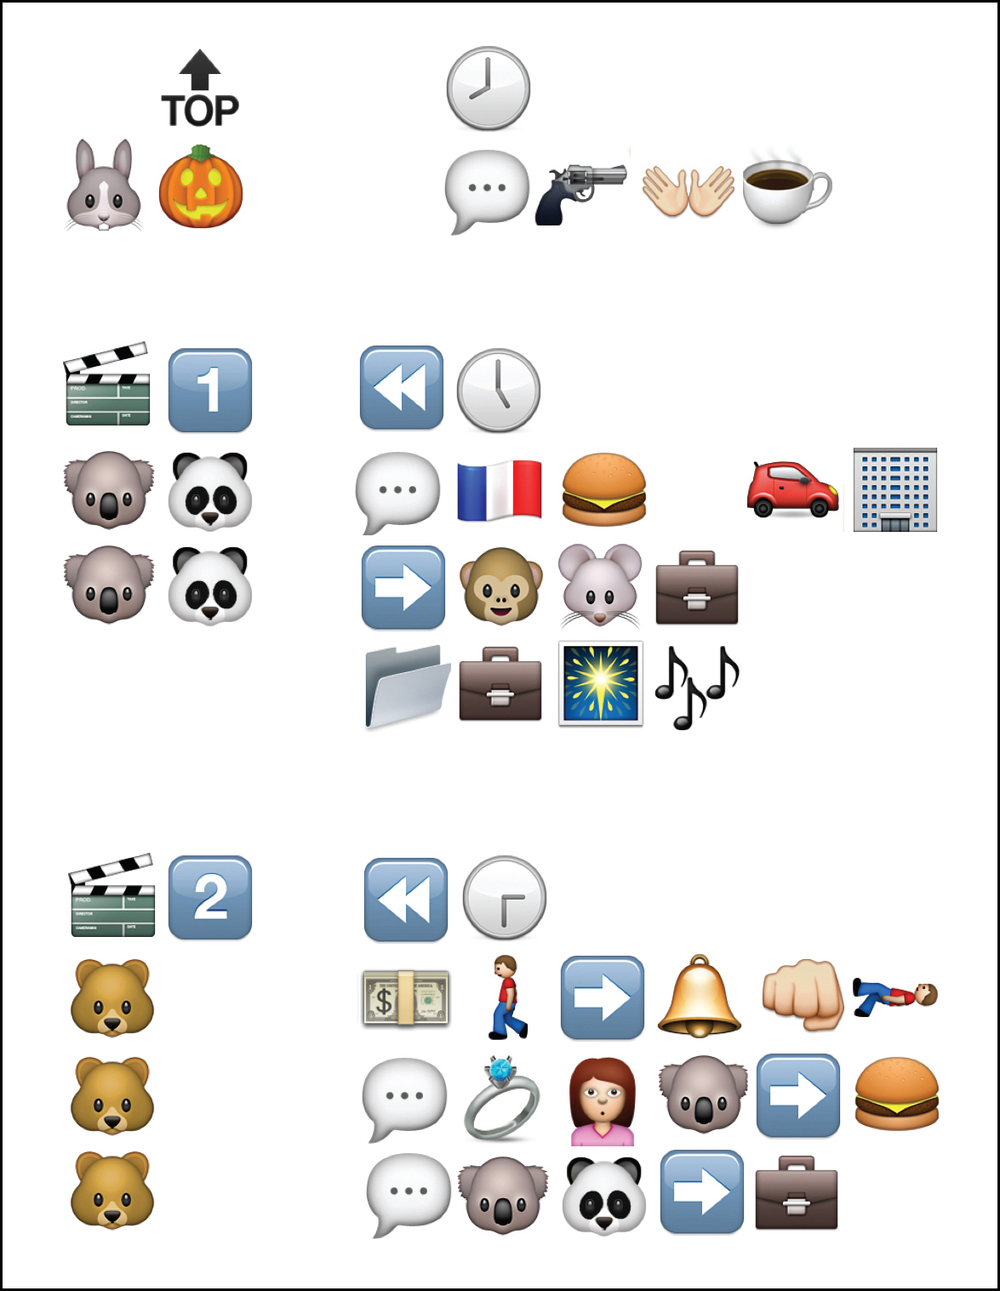 ART2373 Symbol Design - Emoji Narrative Detail: Joshua Johns